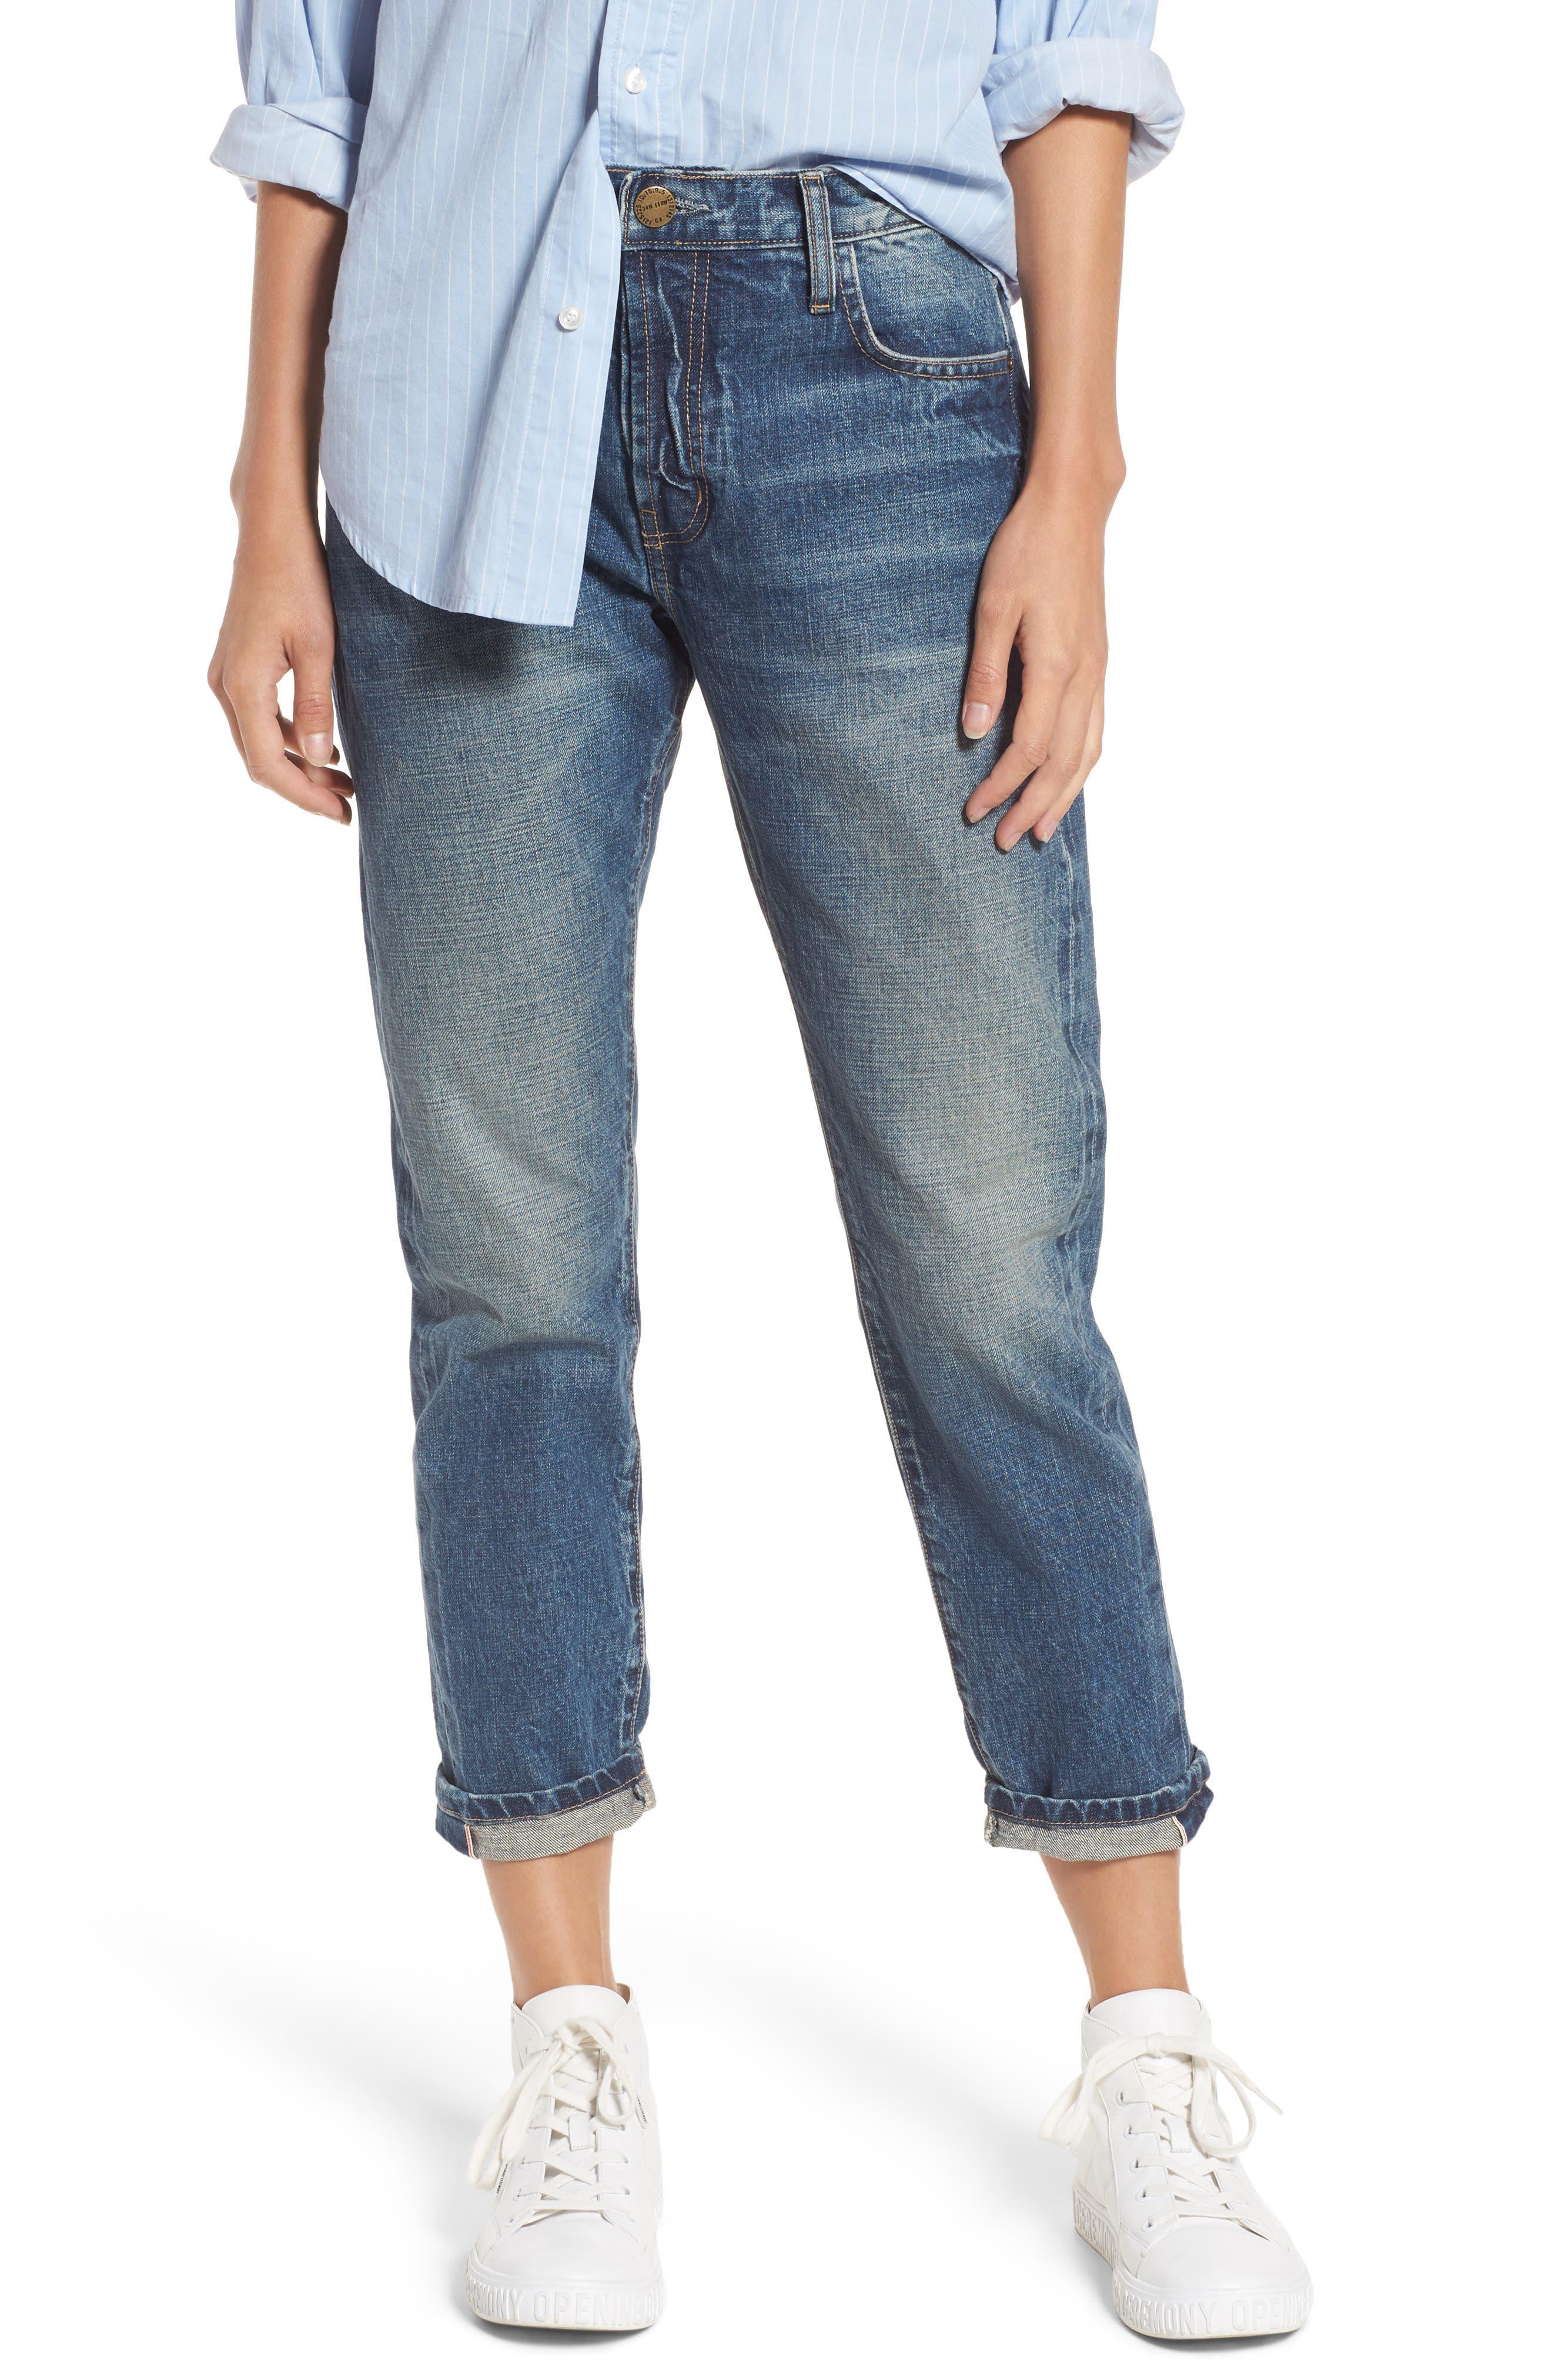 Alternate Image 1 Selected - Current/Elliott The Selvedge High Waist Crop Jeans (Hemet)